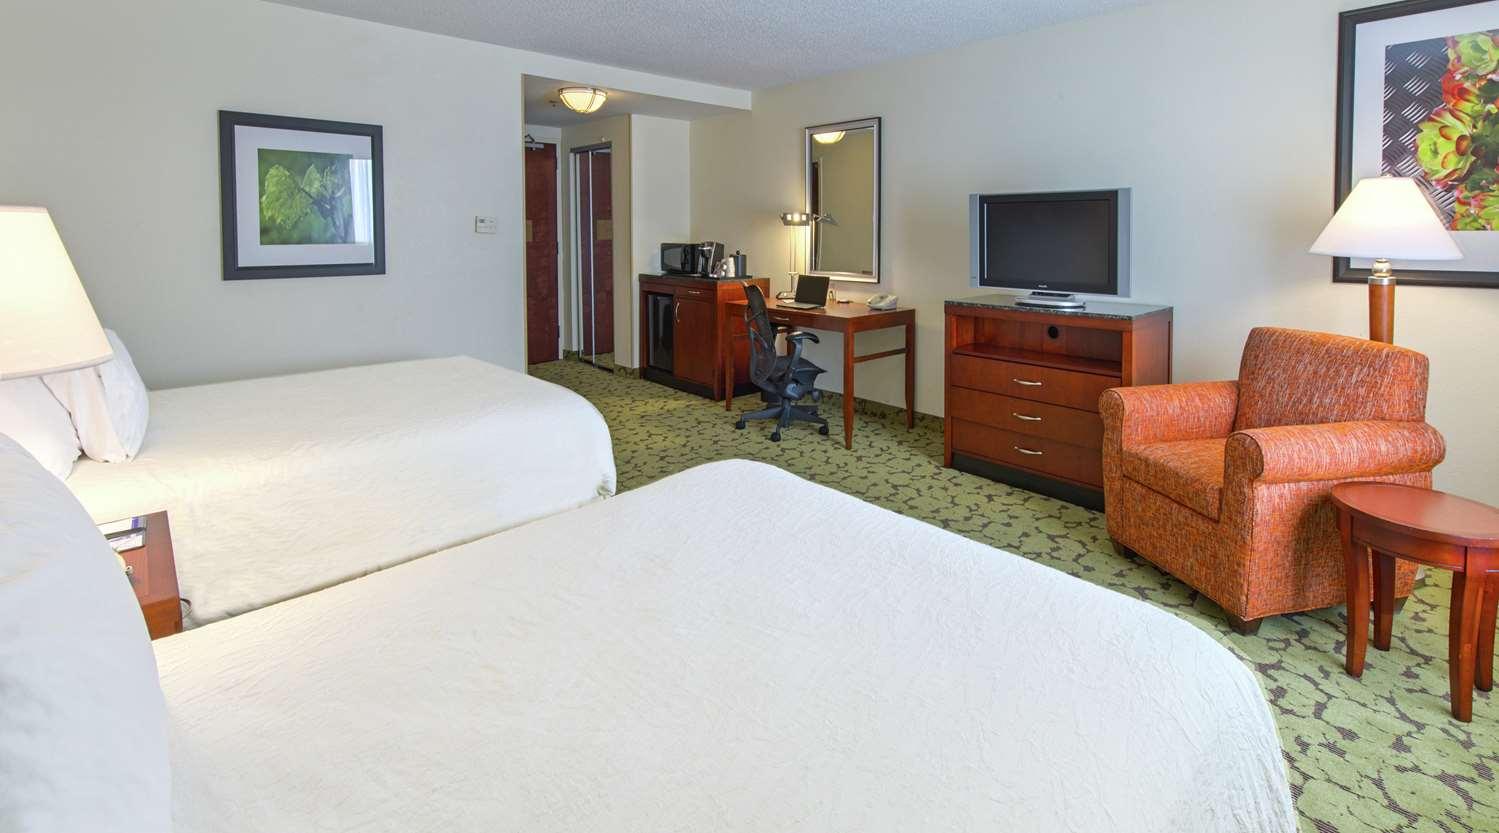 Amenities - Hilton Garden Inn Mercer University Macon